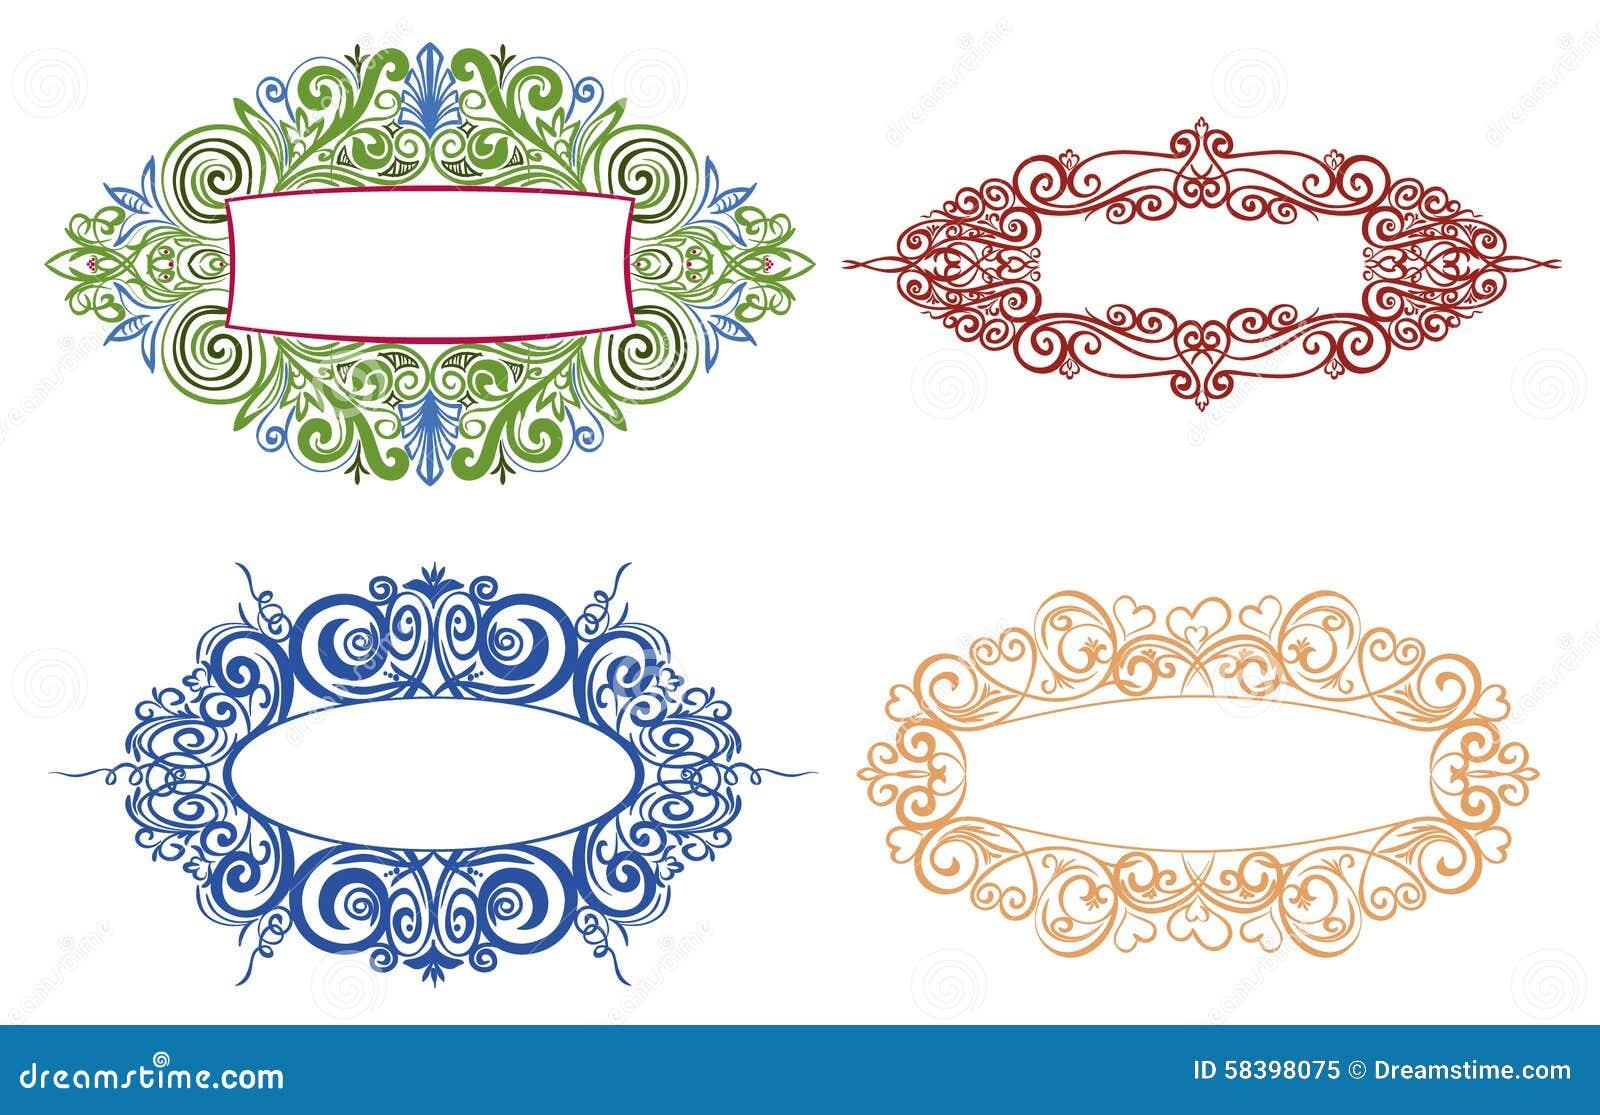 The ornamental frame stock illustration. Illustration of document ...